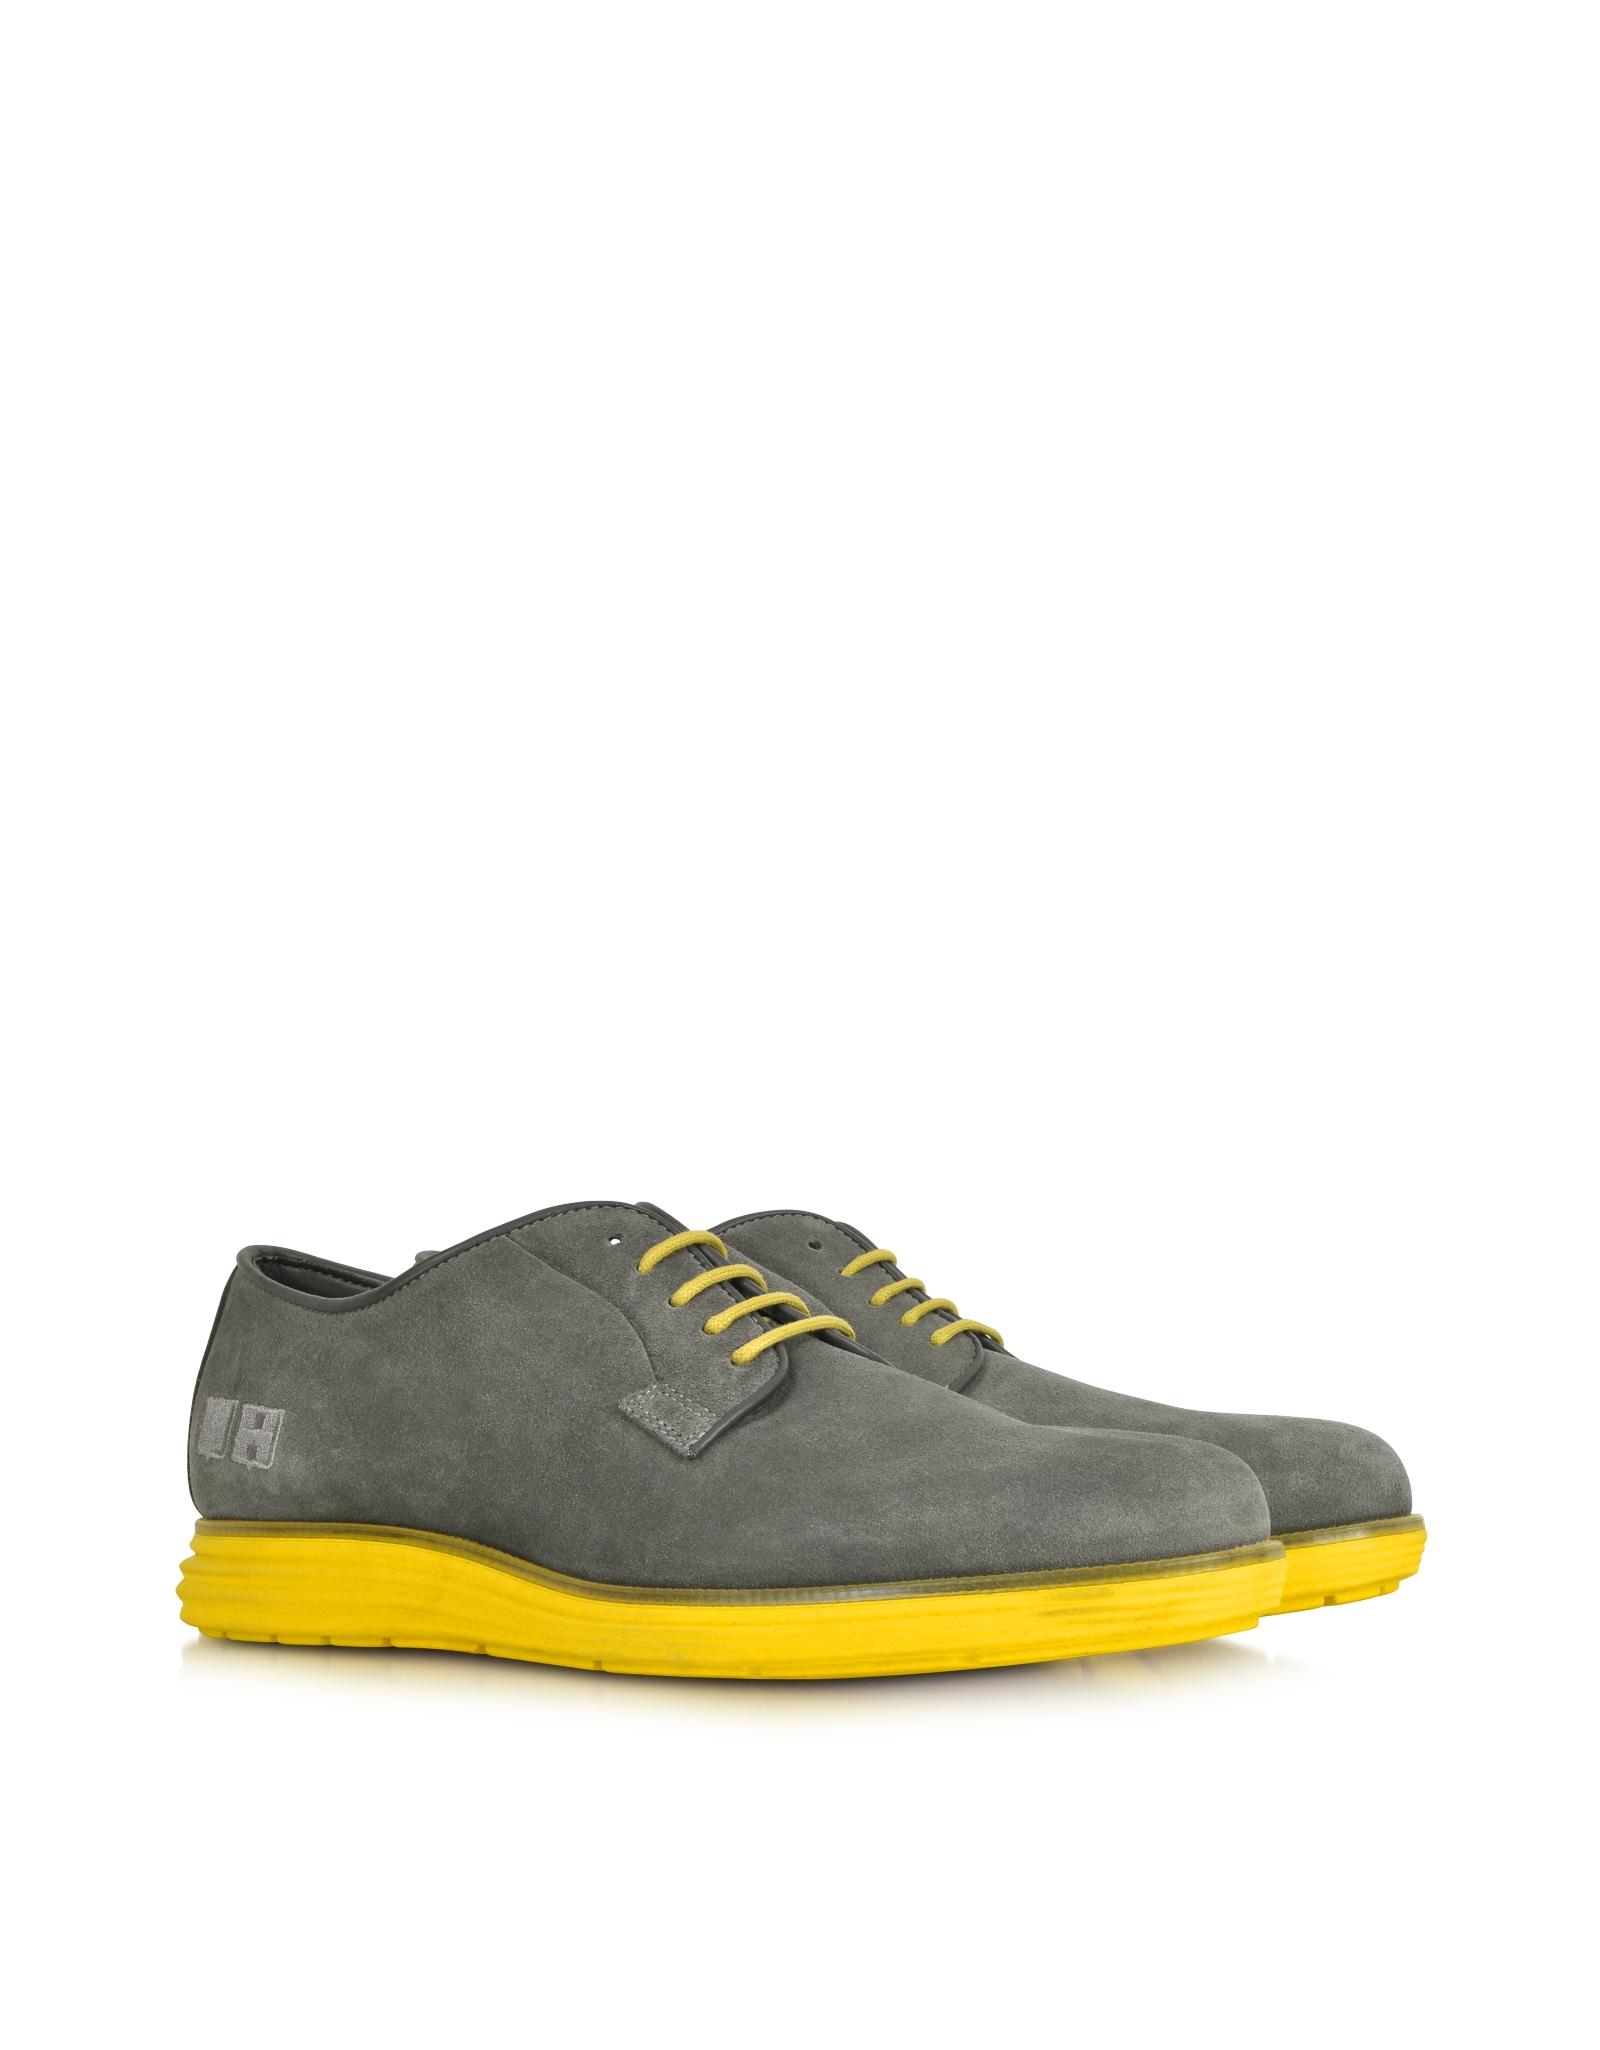 Lyst D Acquasparta Gray Suede Oxford W Yellow Rubber